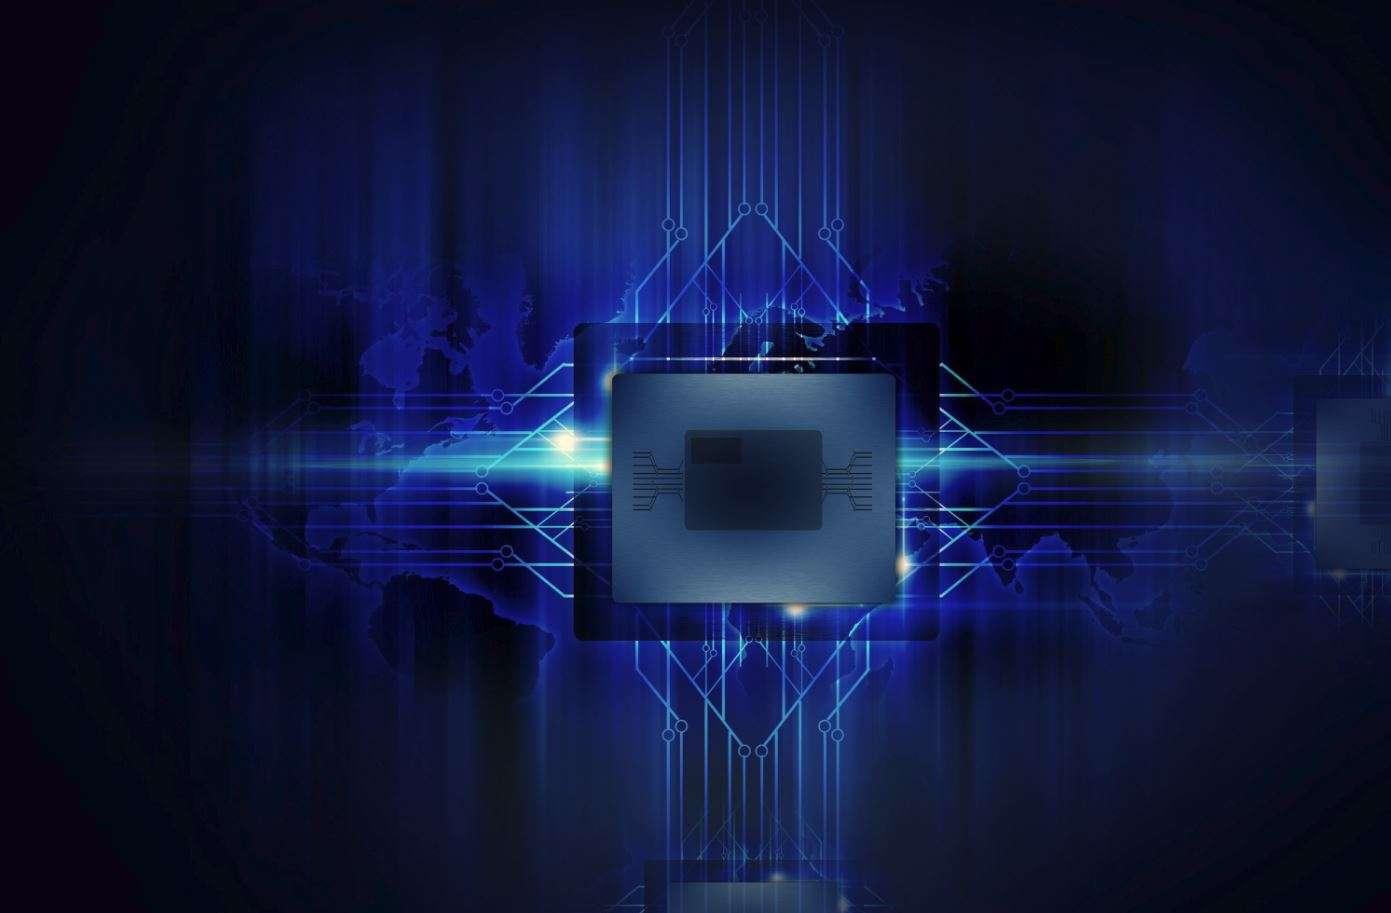 Powerful processor (credit: graphicstock.com)